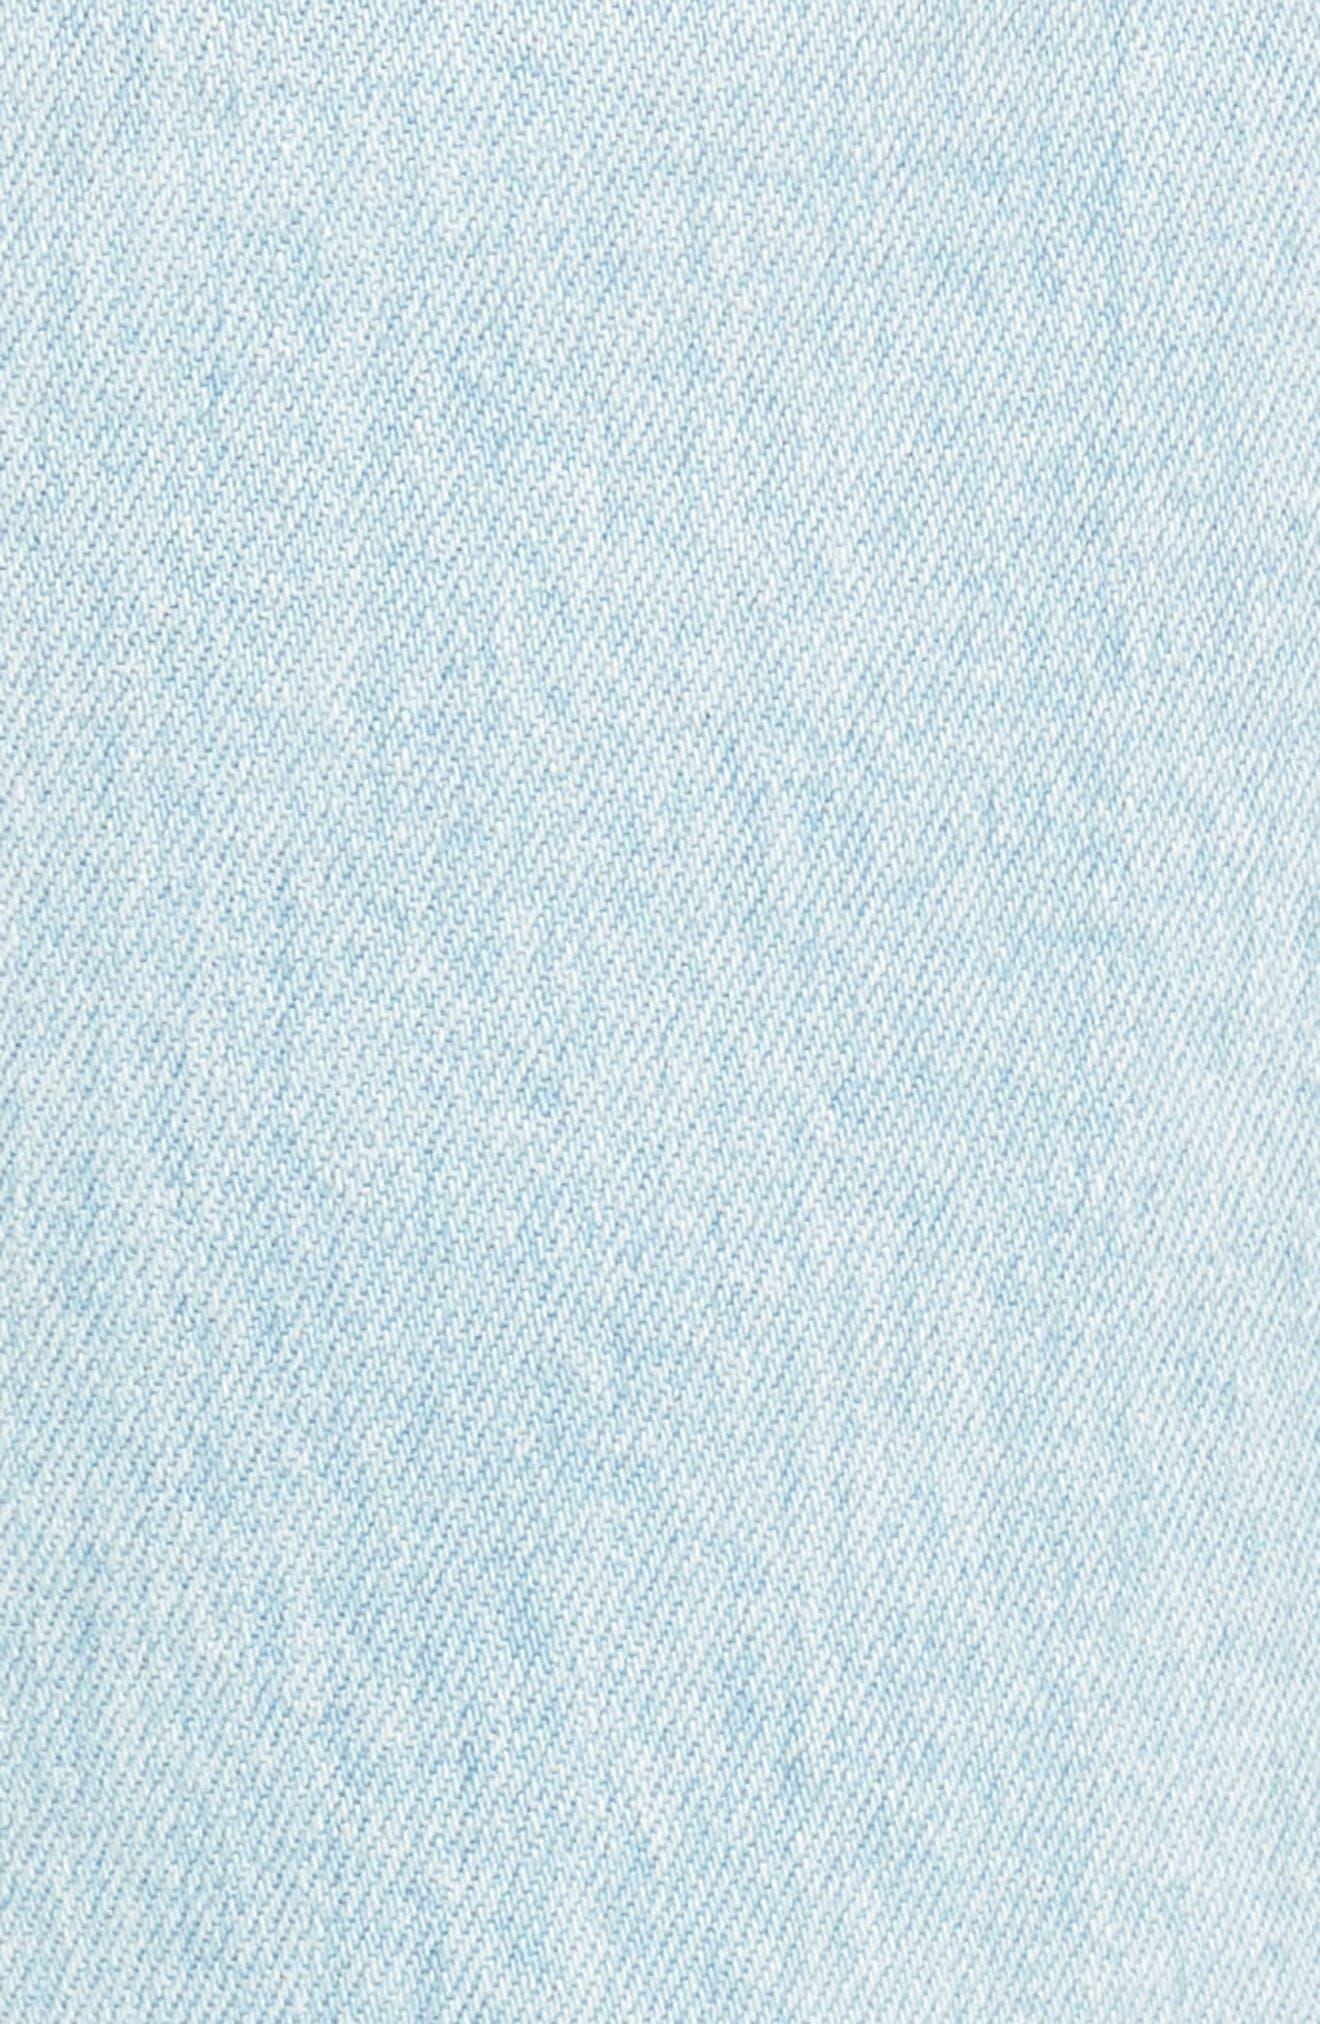 Dylan Skinny Fit Jeans,                             Alternate thumbnail 5, color,                             28 Years Salt Mist